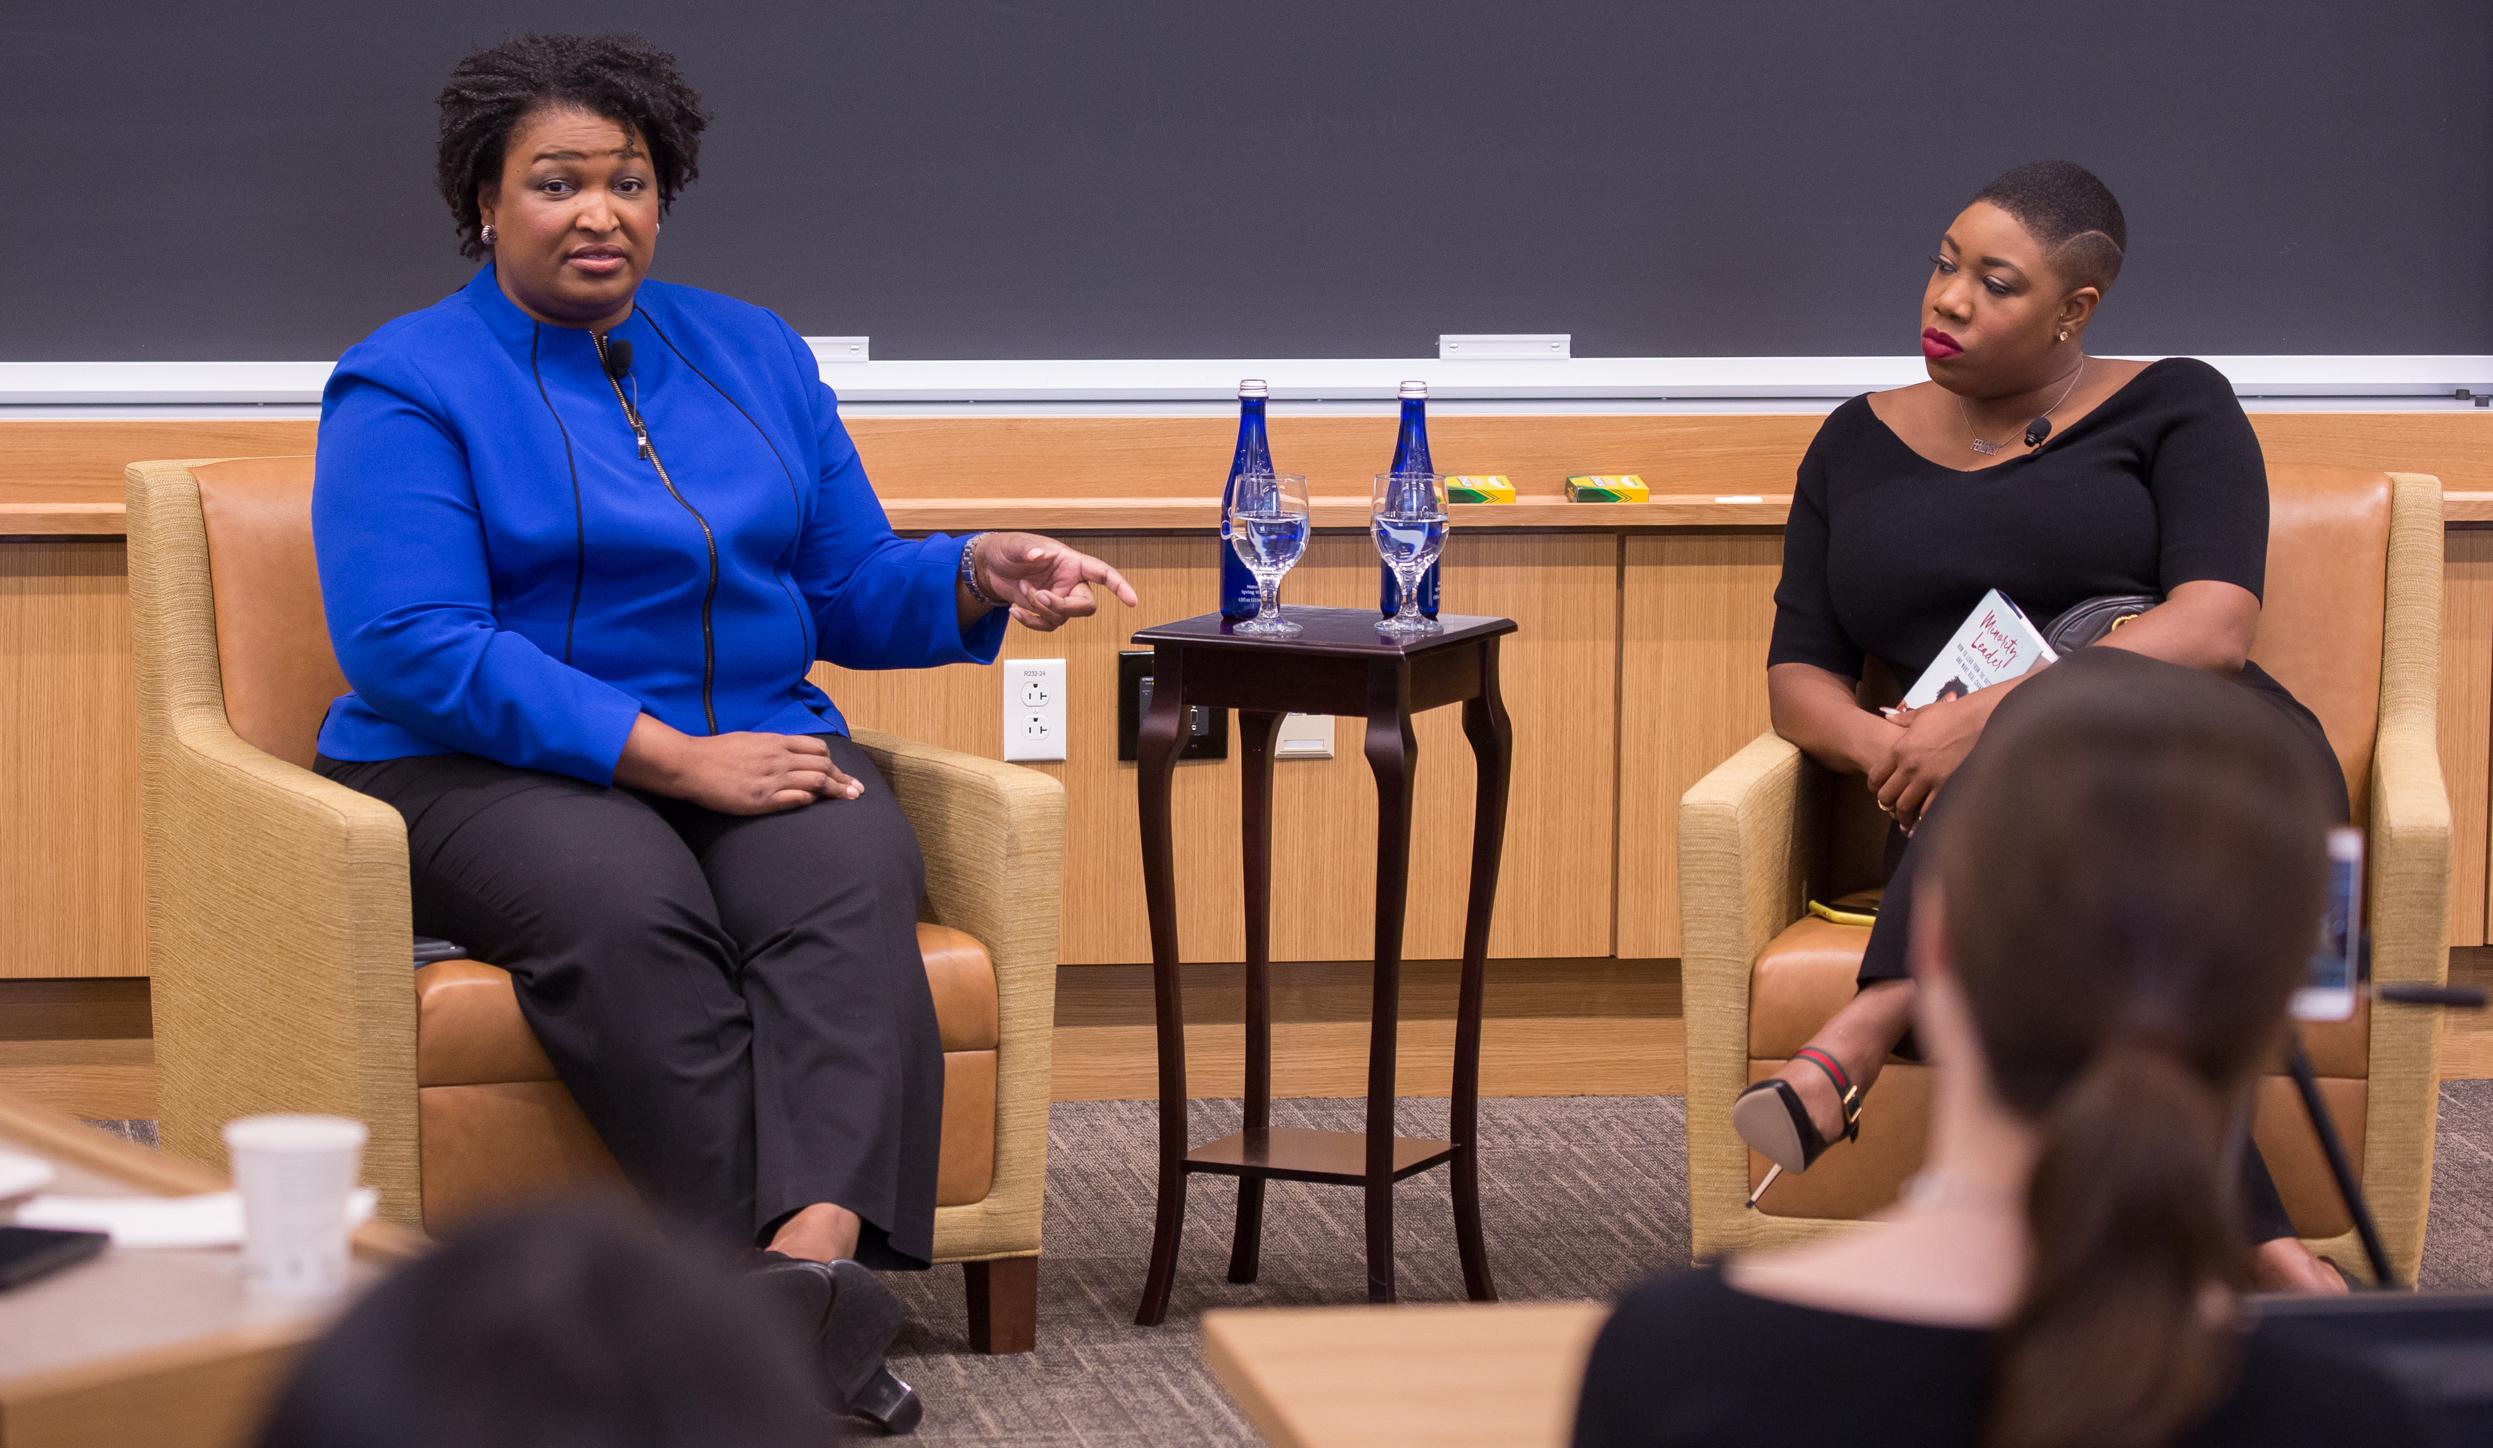 Georgia gubernatorial candidate Stacey Abrams speaking at Harvard University earlier this year ( Image )